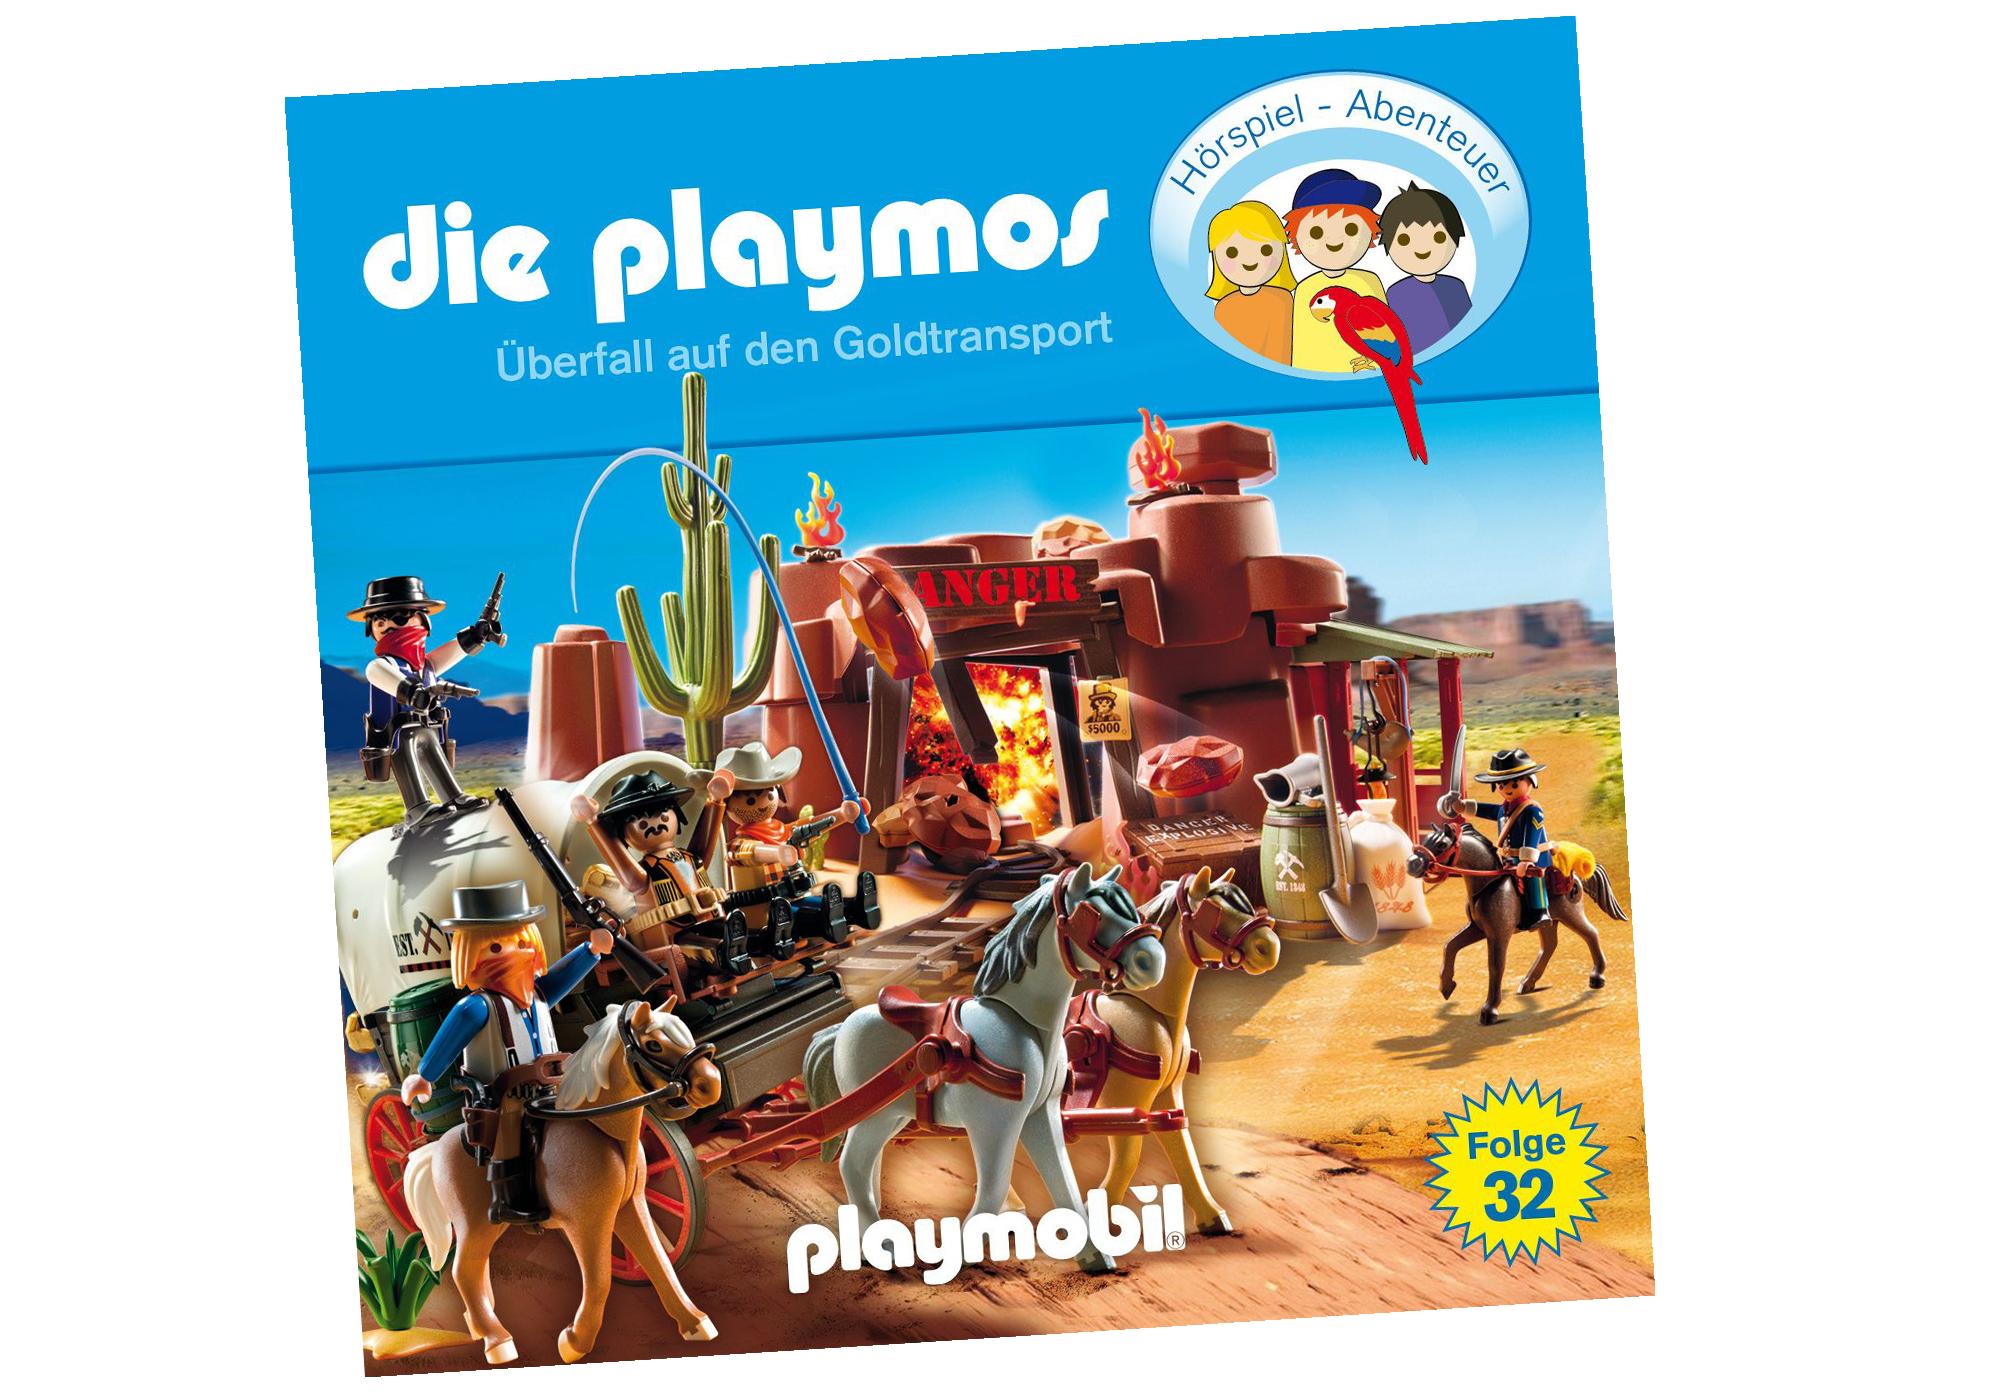 http://media.playmobil.com/i/playmobil/80351_product_detail/Überfall auf den Goldtransport (32) - CD